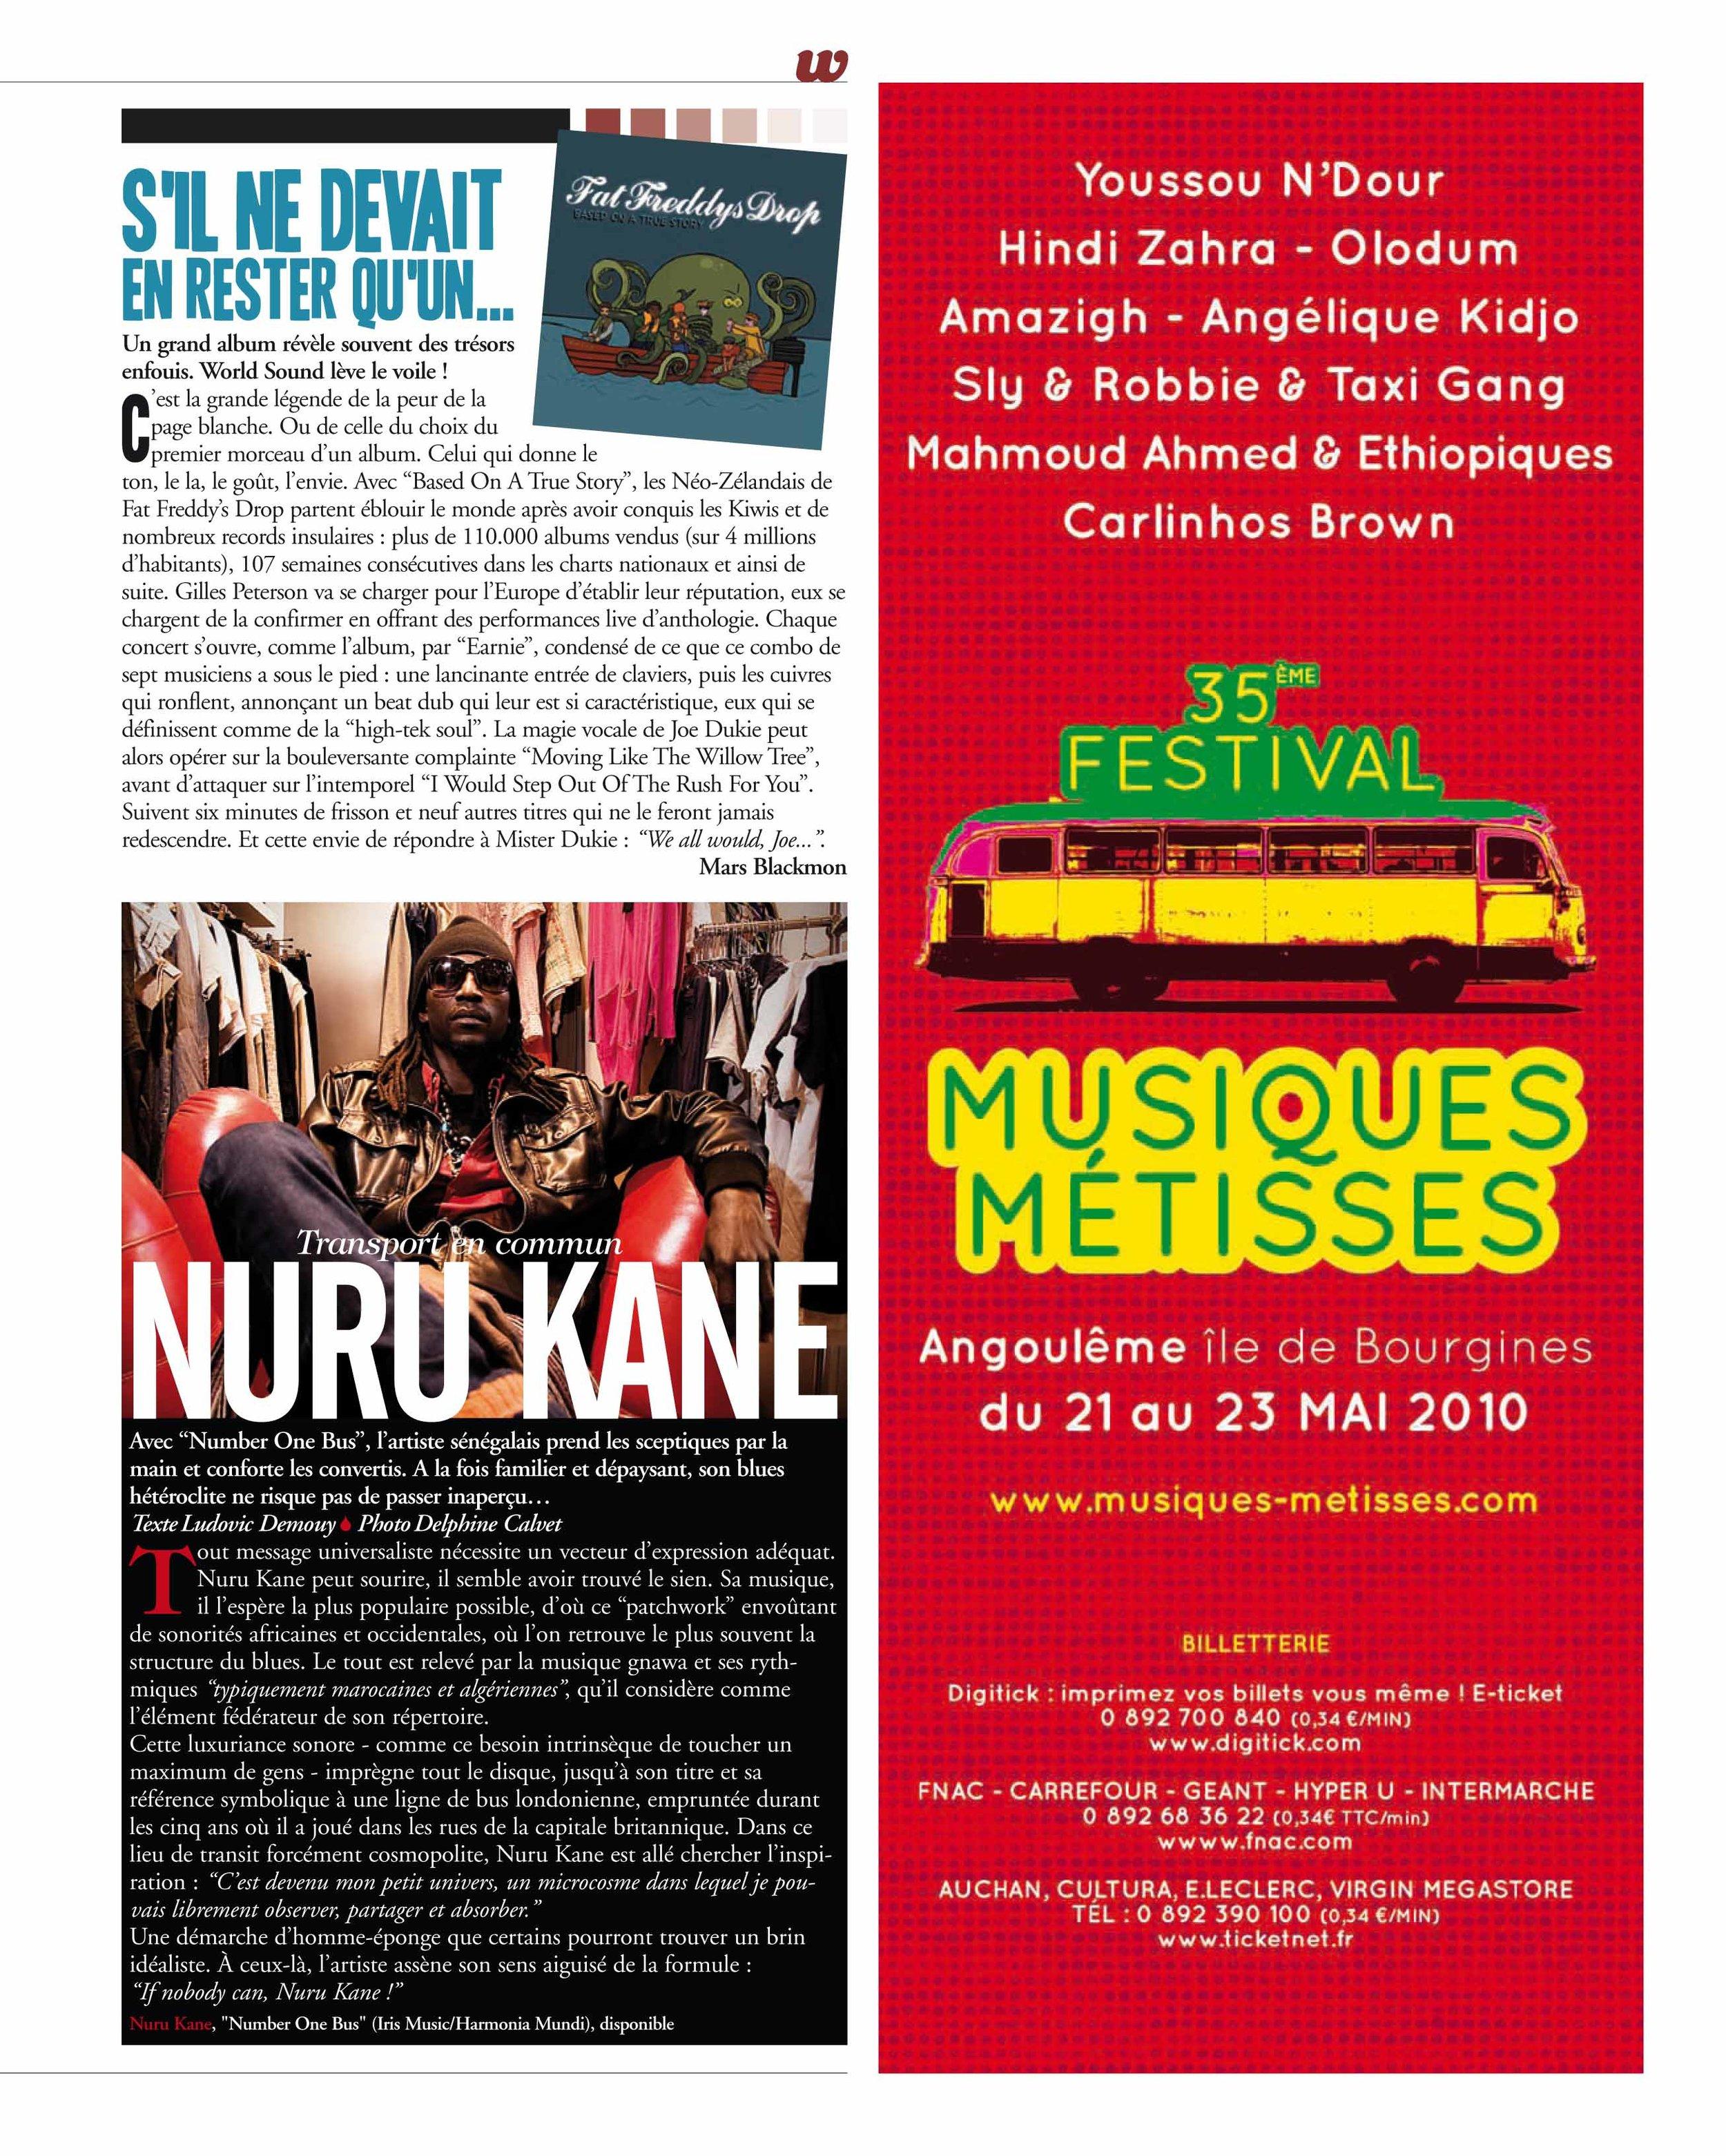 Nuru Kane (World Sound)